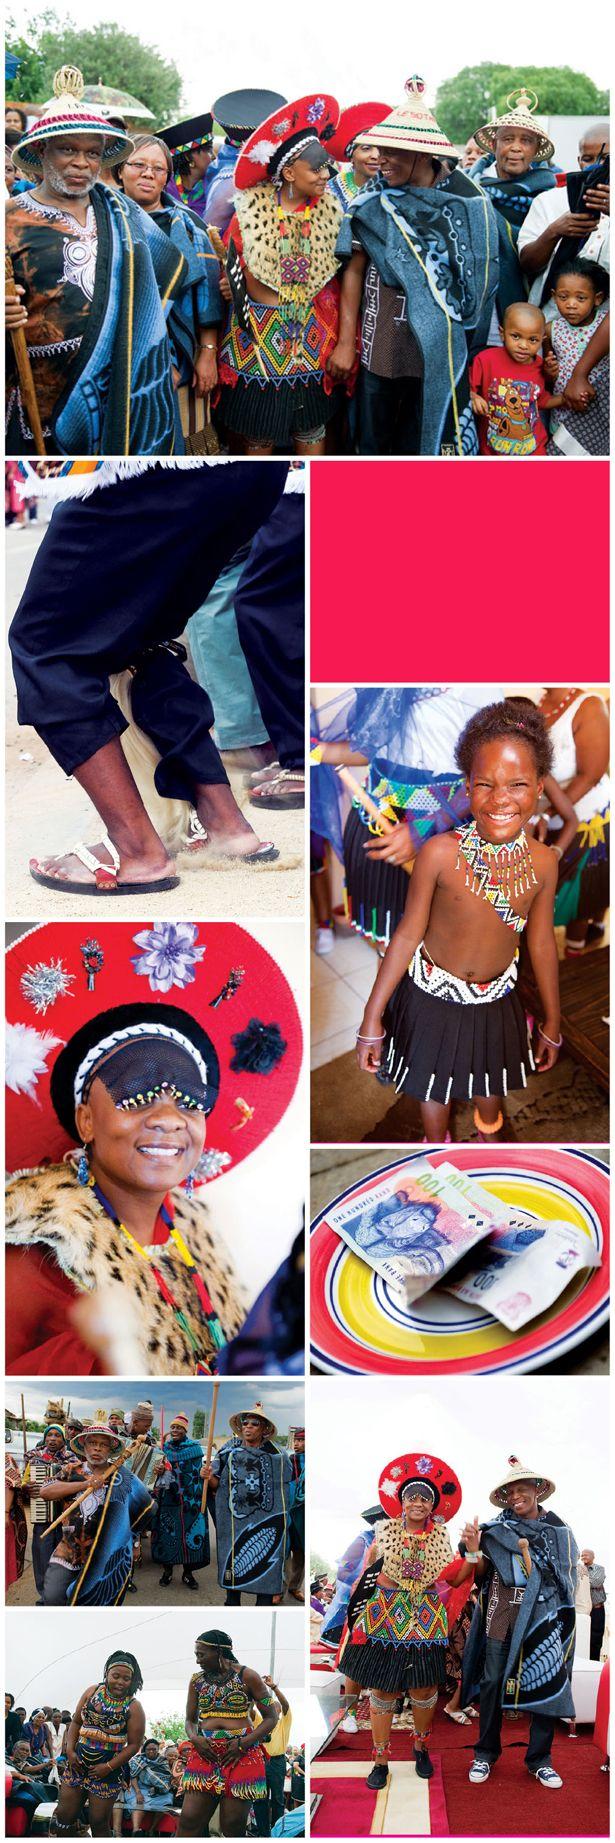 Zulu traditional dress in zulu kraal kwazulu natal - A Traditional Wedding In South Africa A Mixture Of Two Cultures Zulu Meets